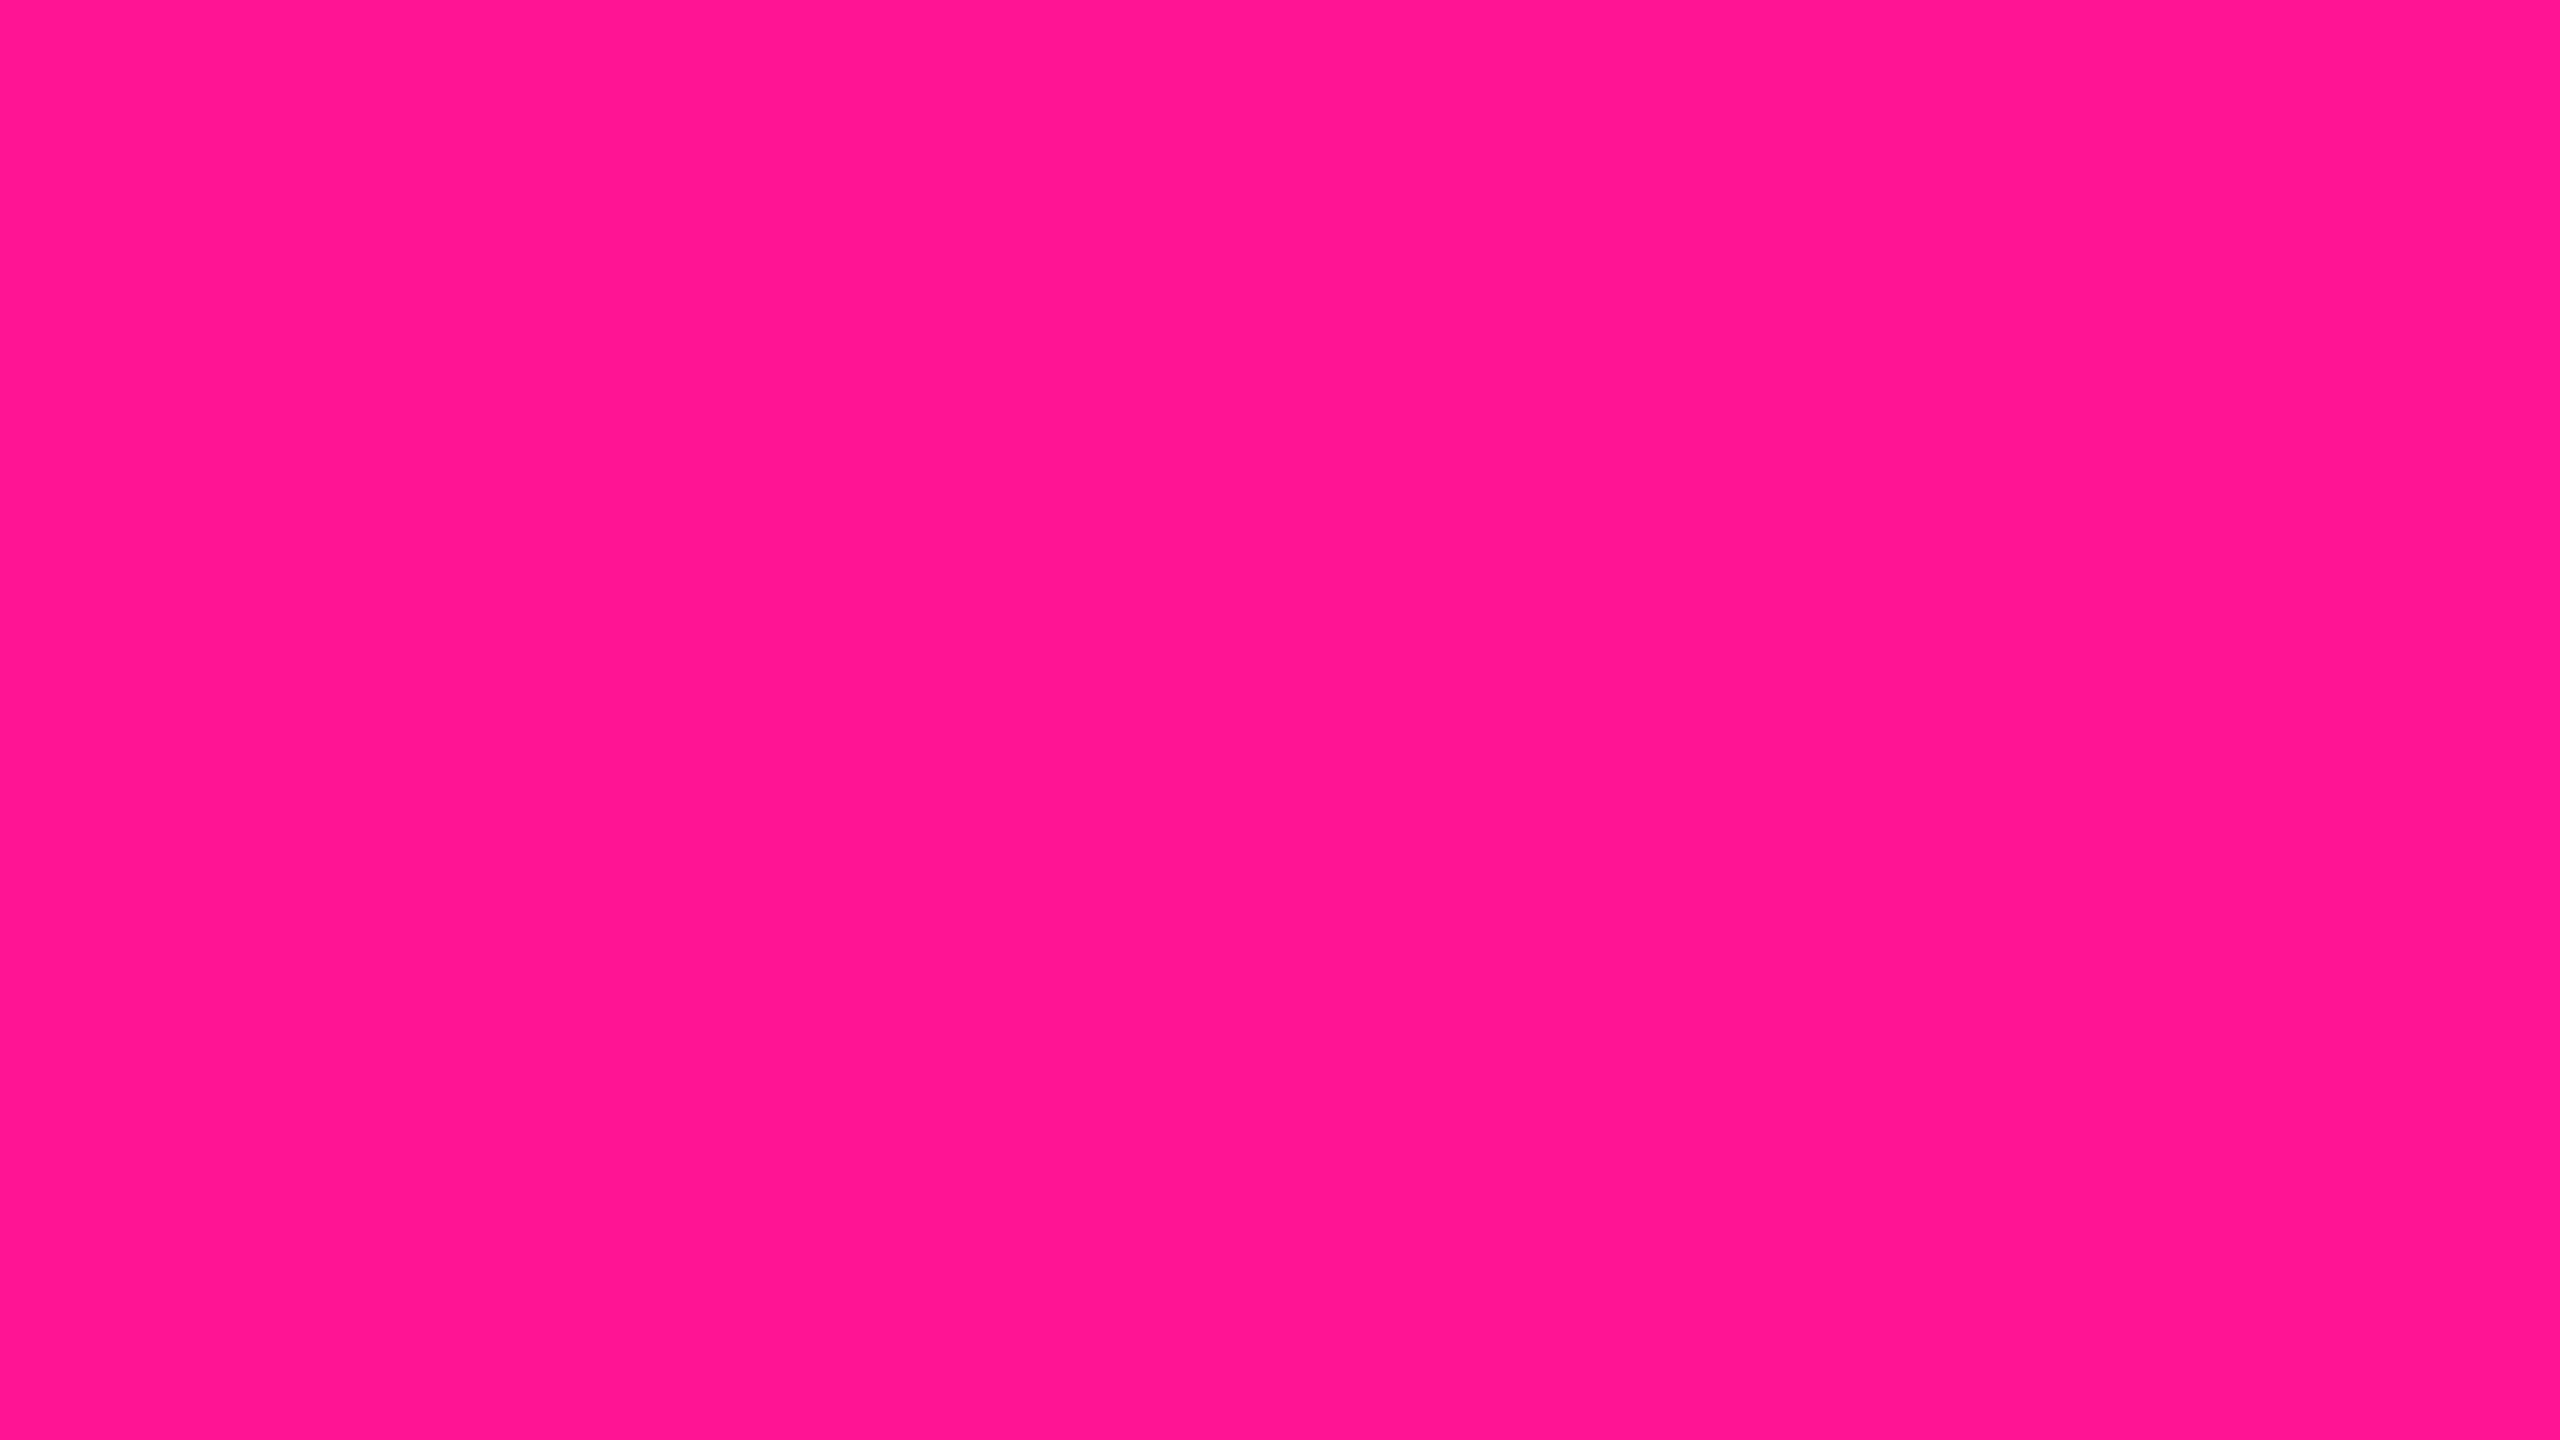 Download Light Pink Plain Wallpaper Gallery |Plain Pink Backgrounds